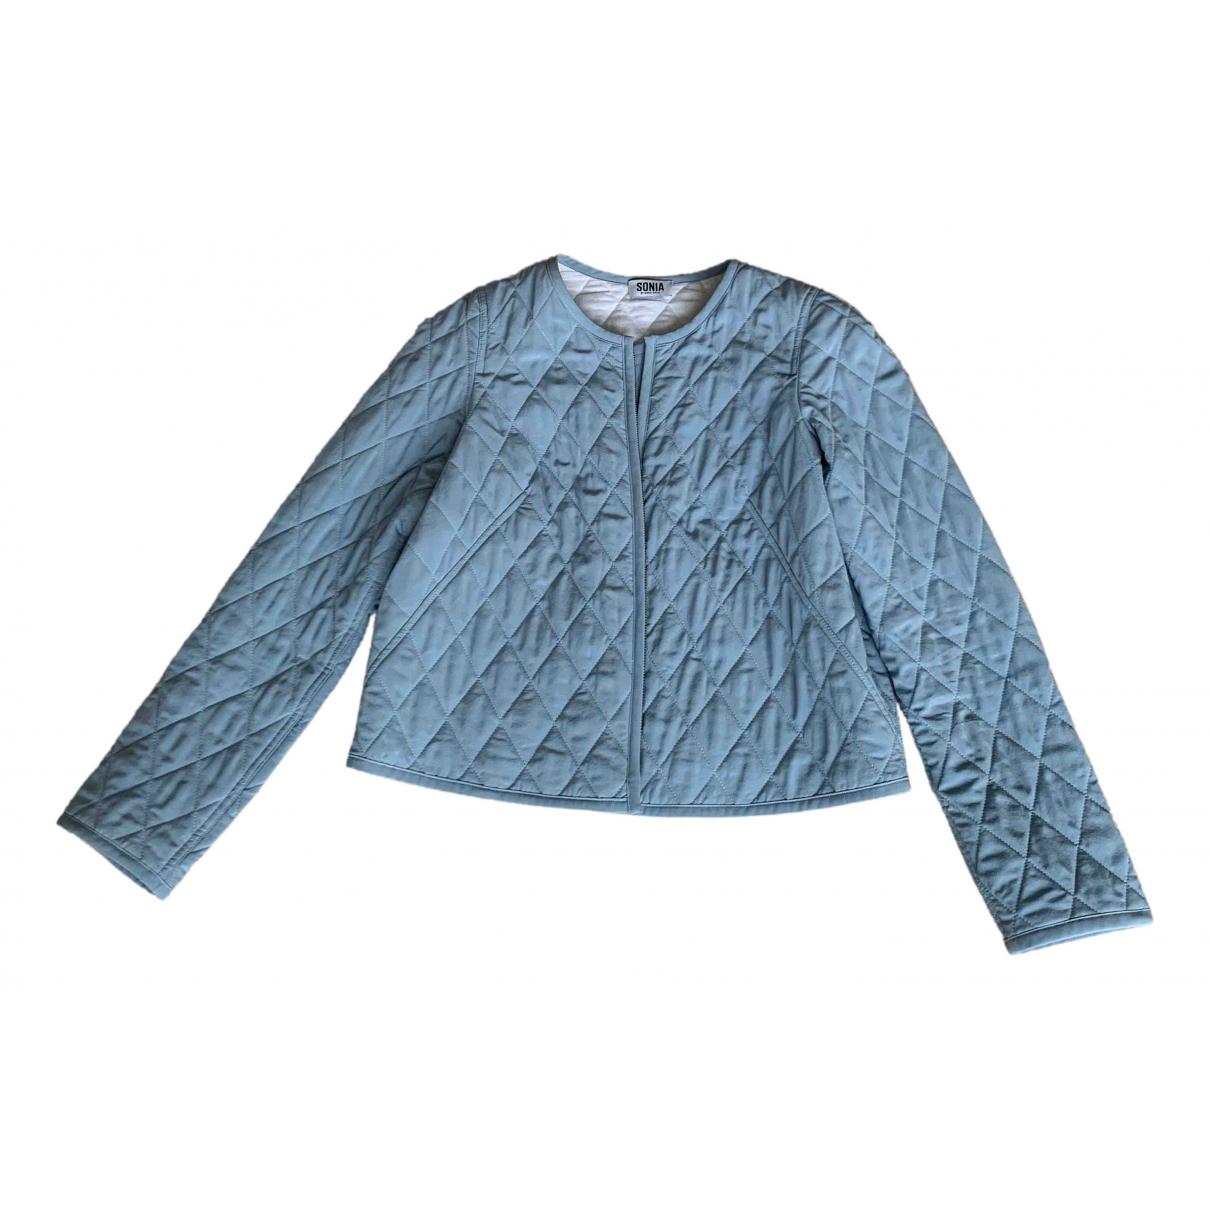 Sonia By Sonia Rykiel - Veste   pour femme en soie - bleu